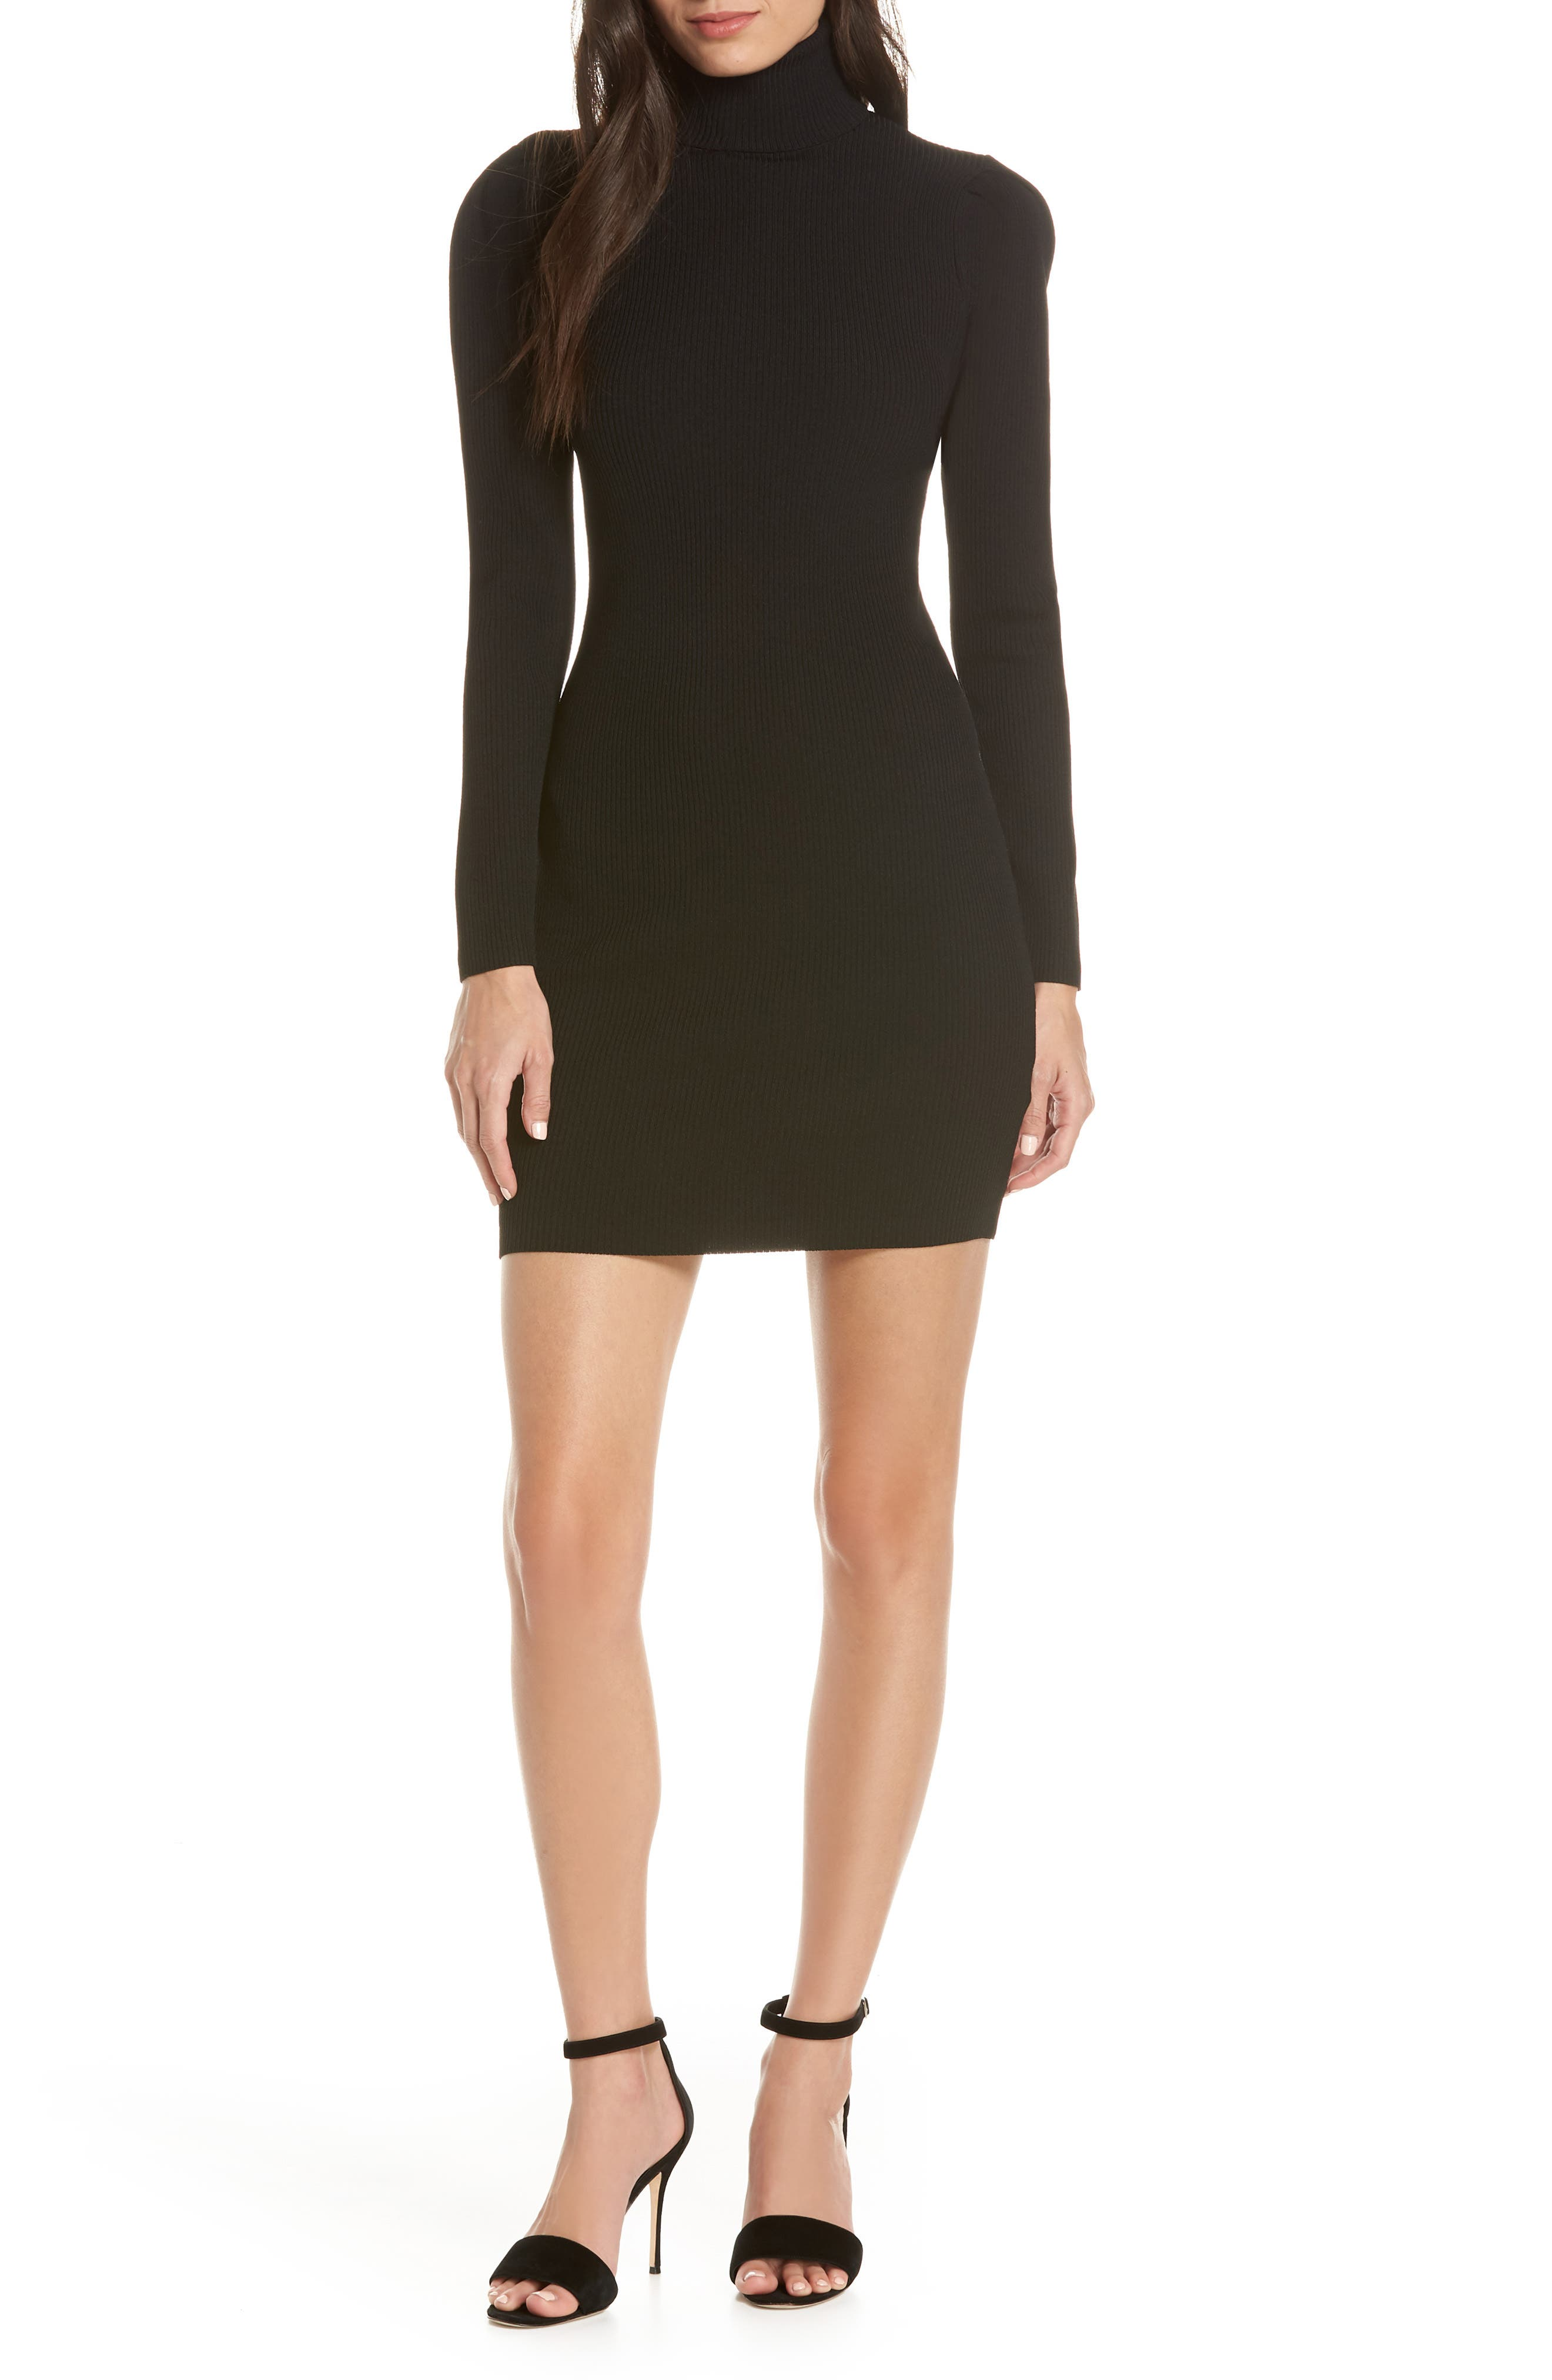 ALI & JAY Best of My Love Turtleneck Sweater Dress, Main, color, 001